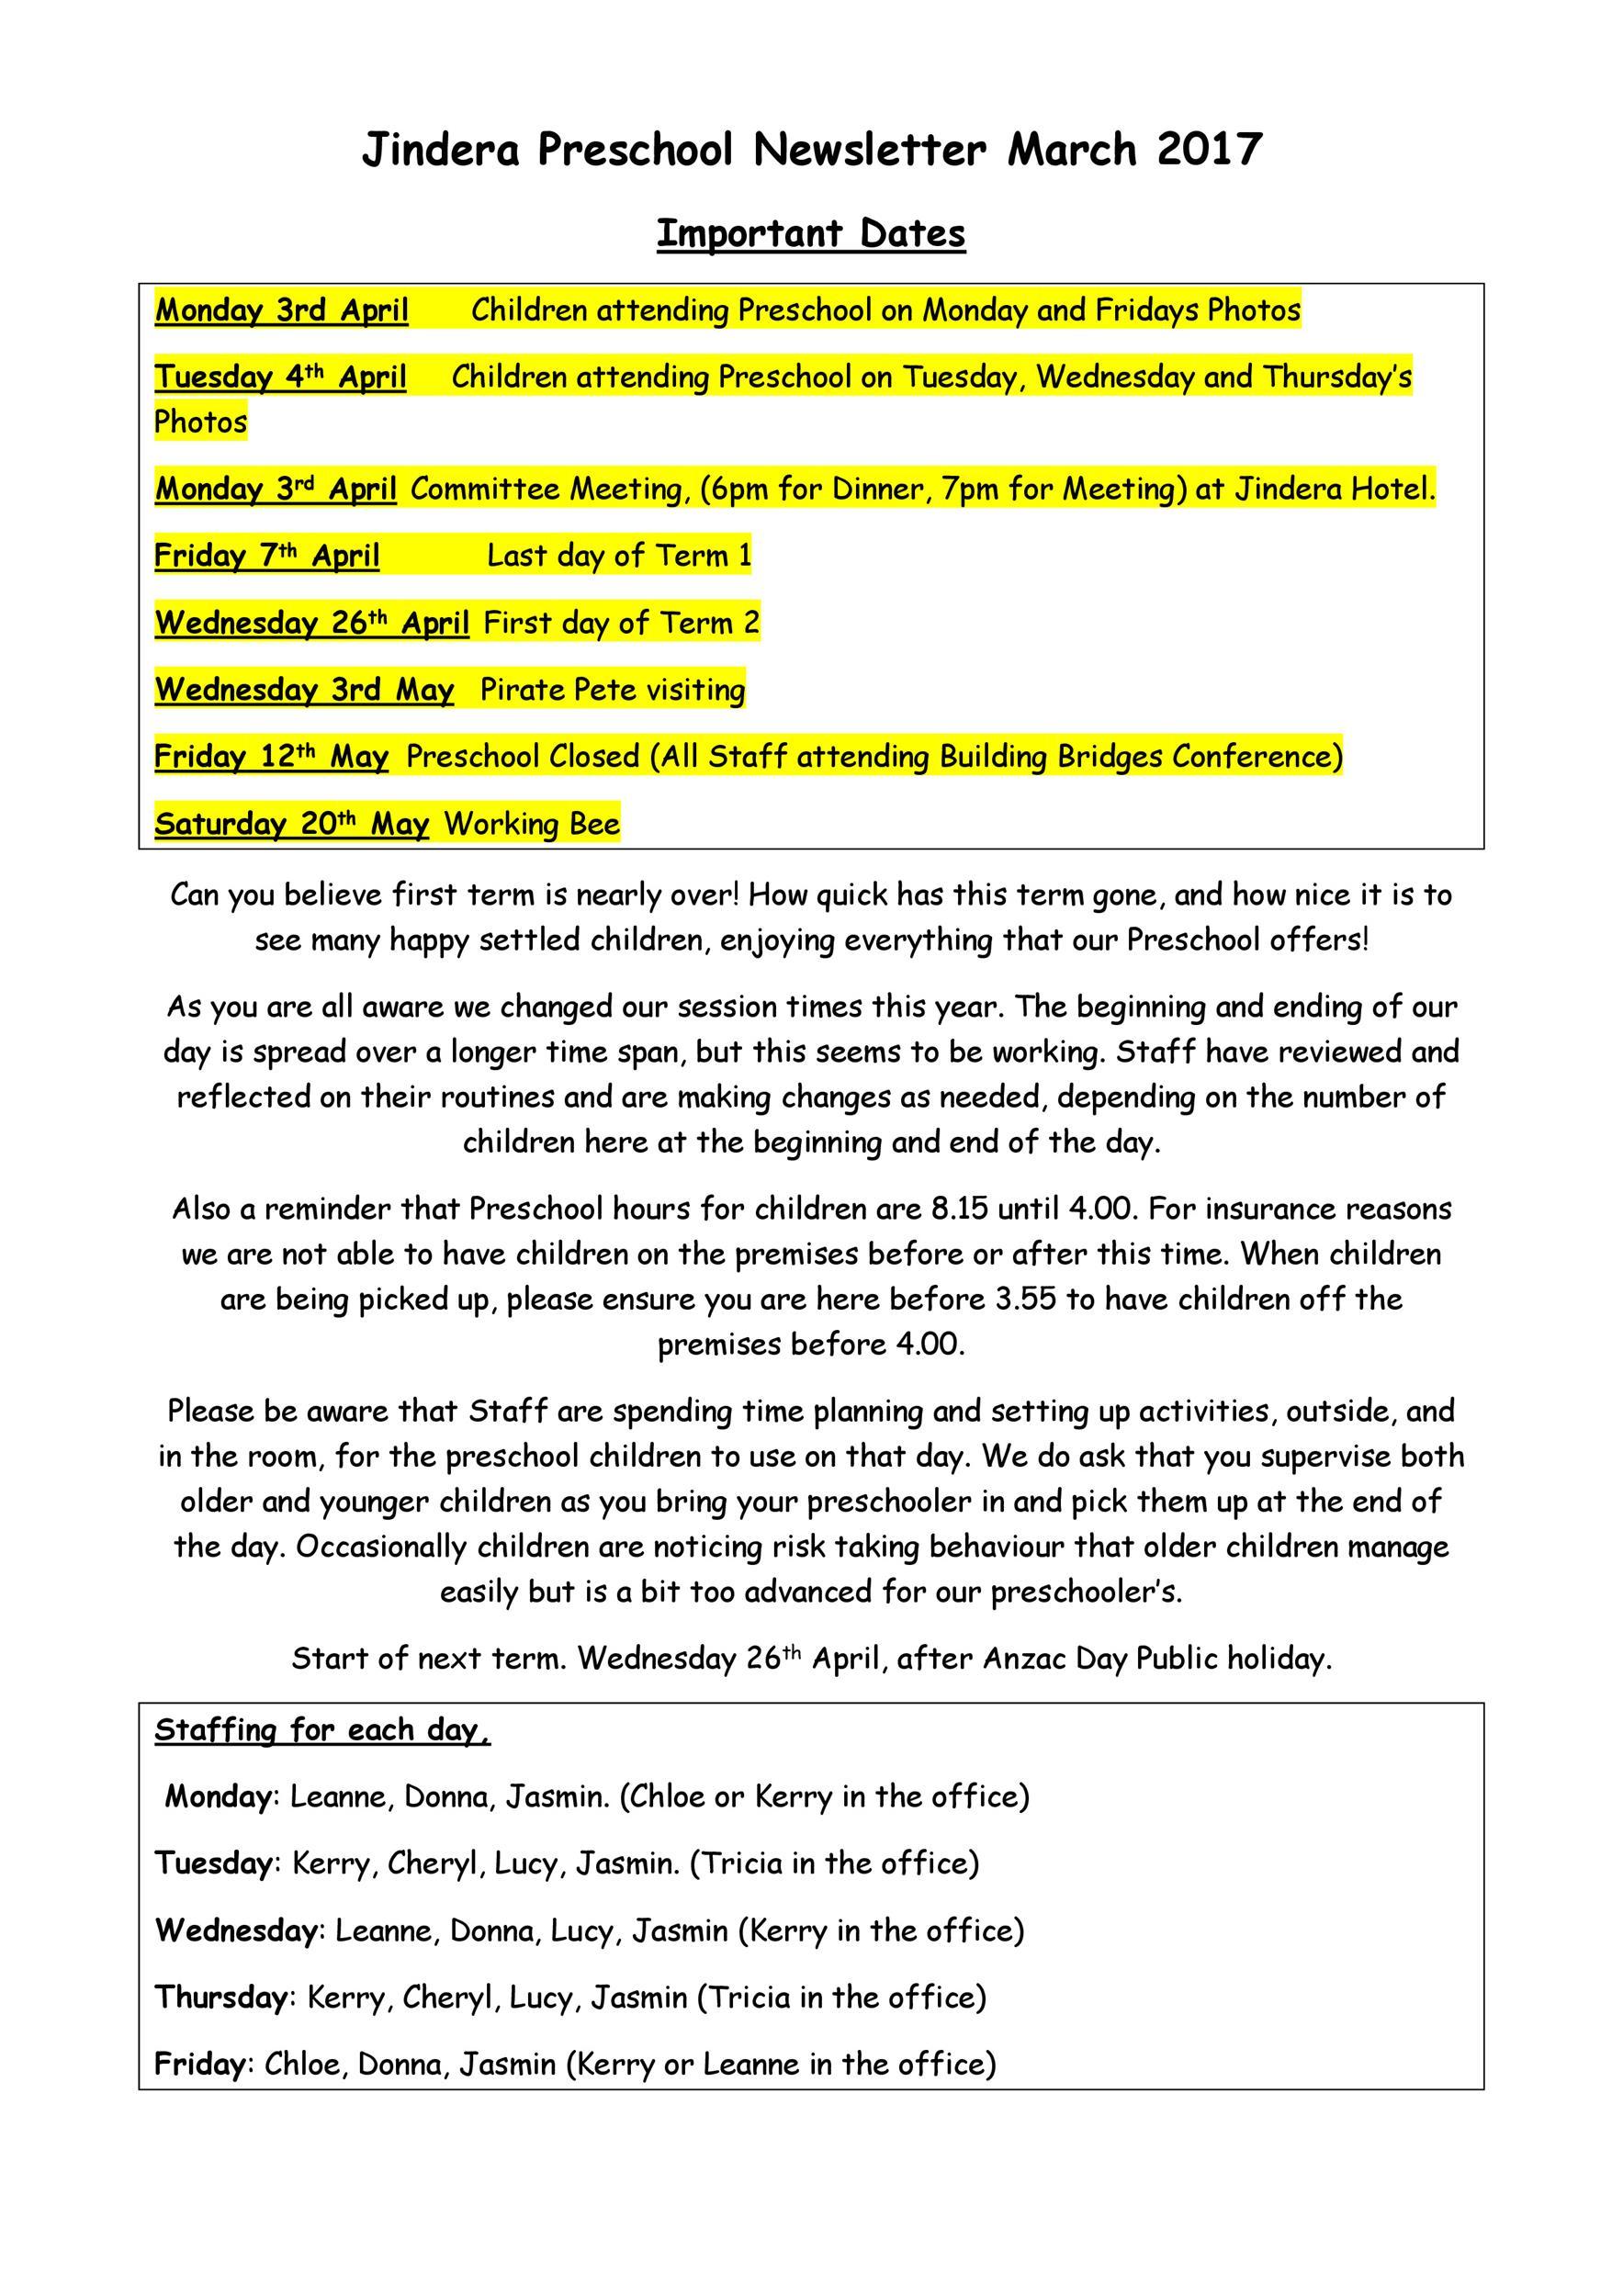 Free preschool newsletter template 12